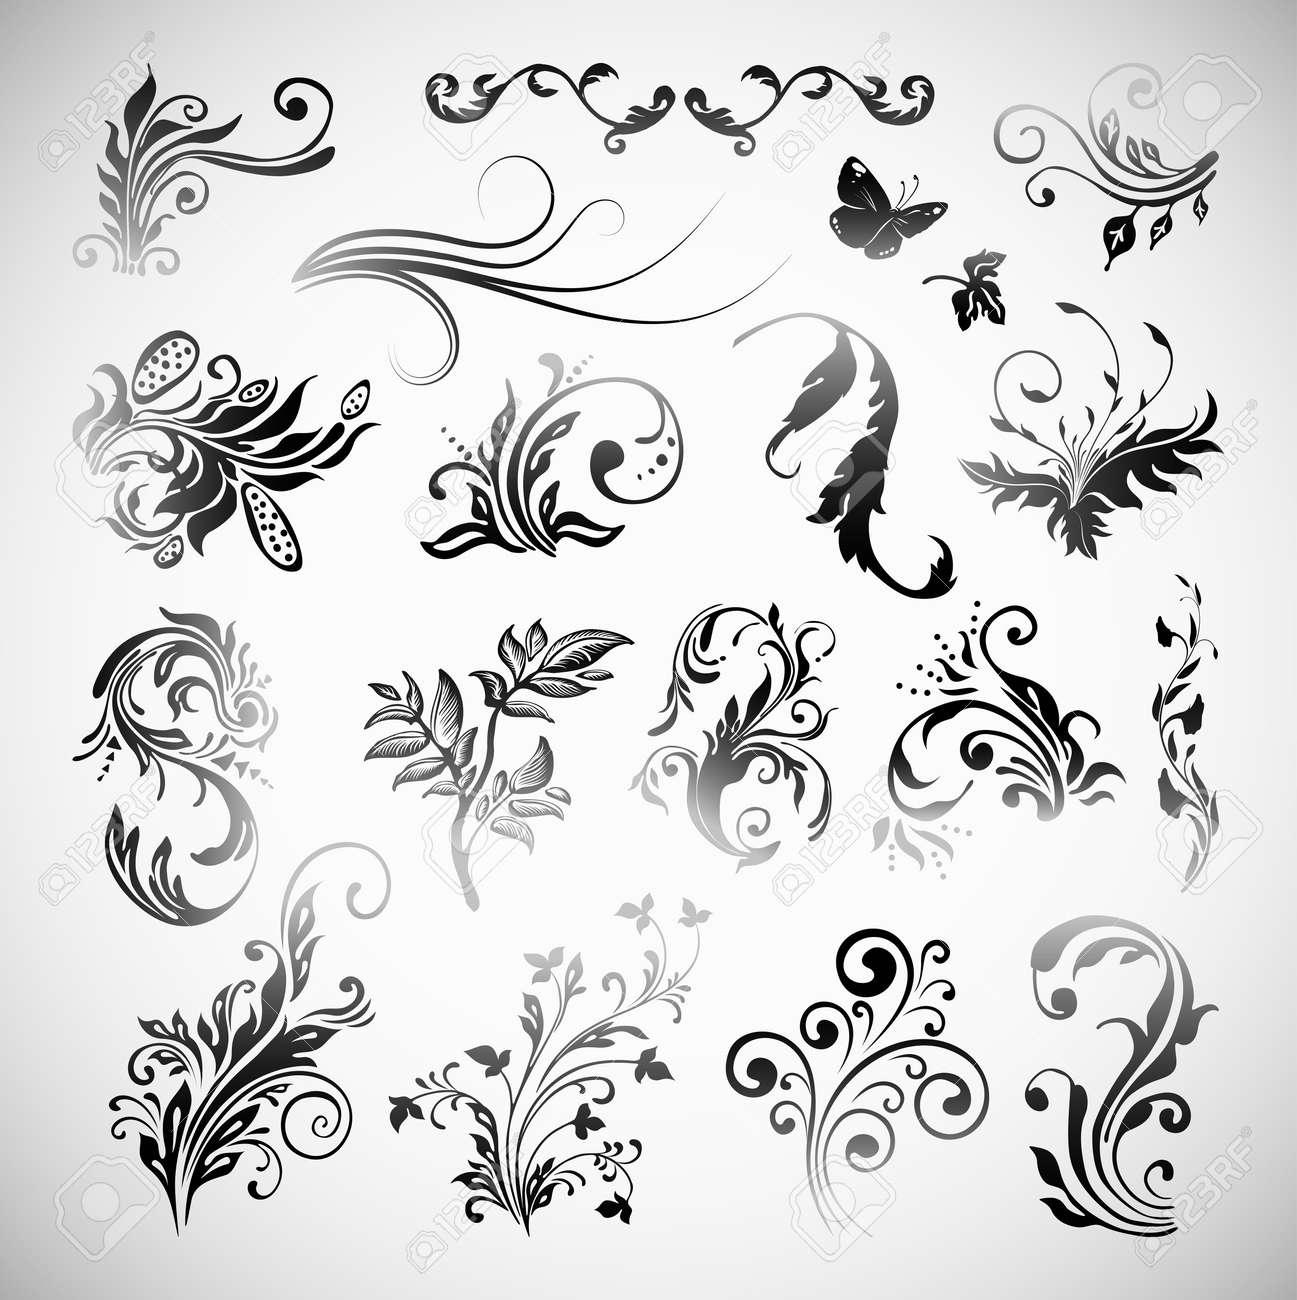 Ornament Flowers Vintage Design Elements Stock Vector - 15654710